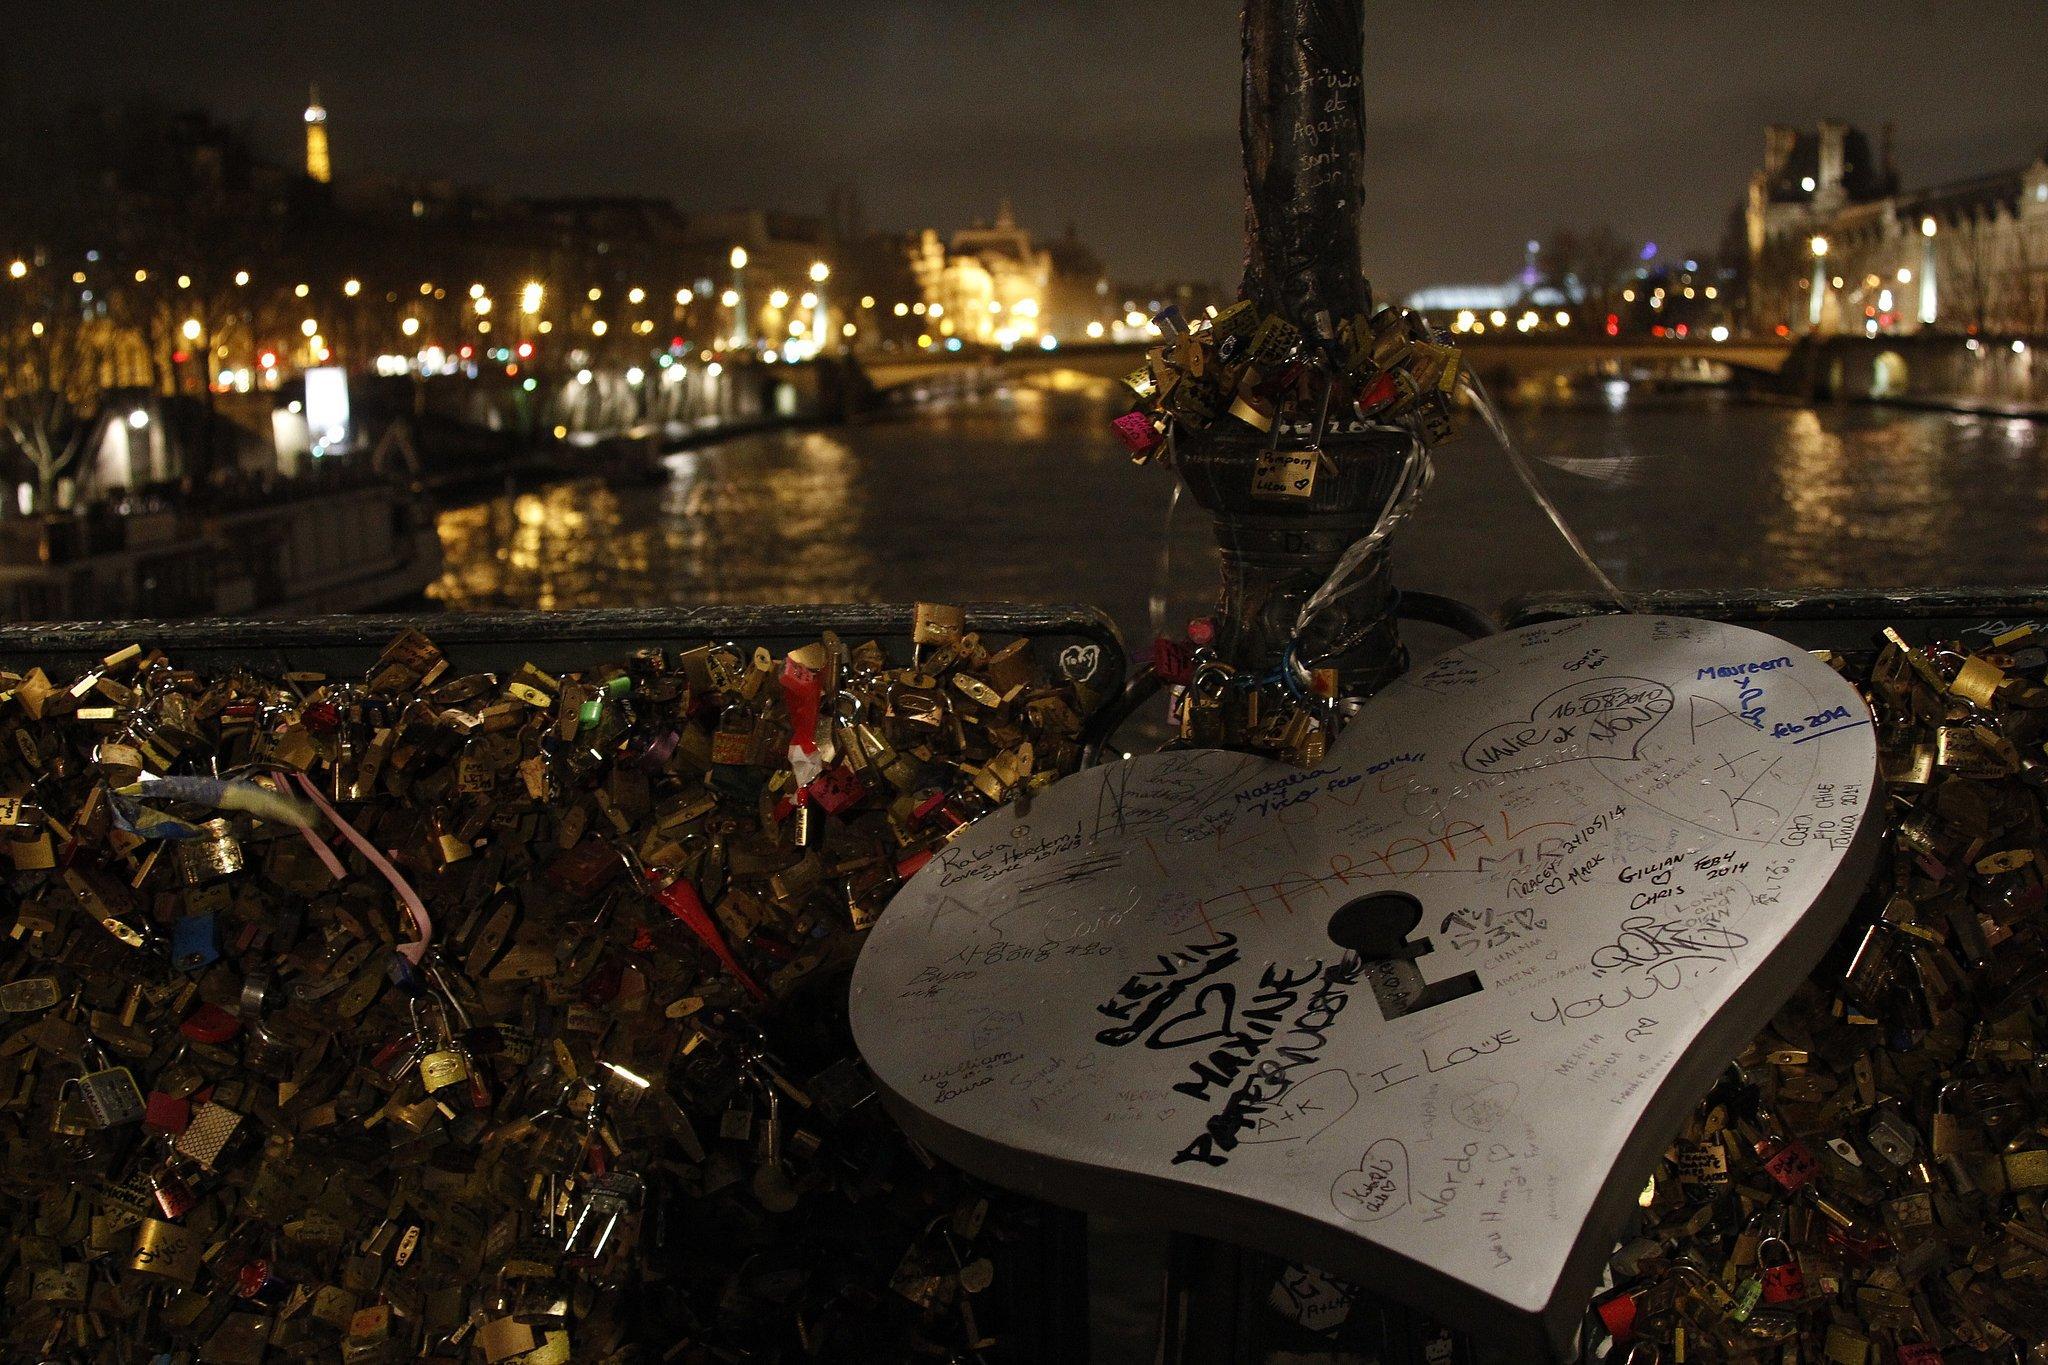 A huge love padlock made a statement on the Pont des Arts bridge in Paris.